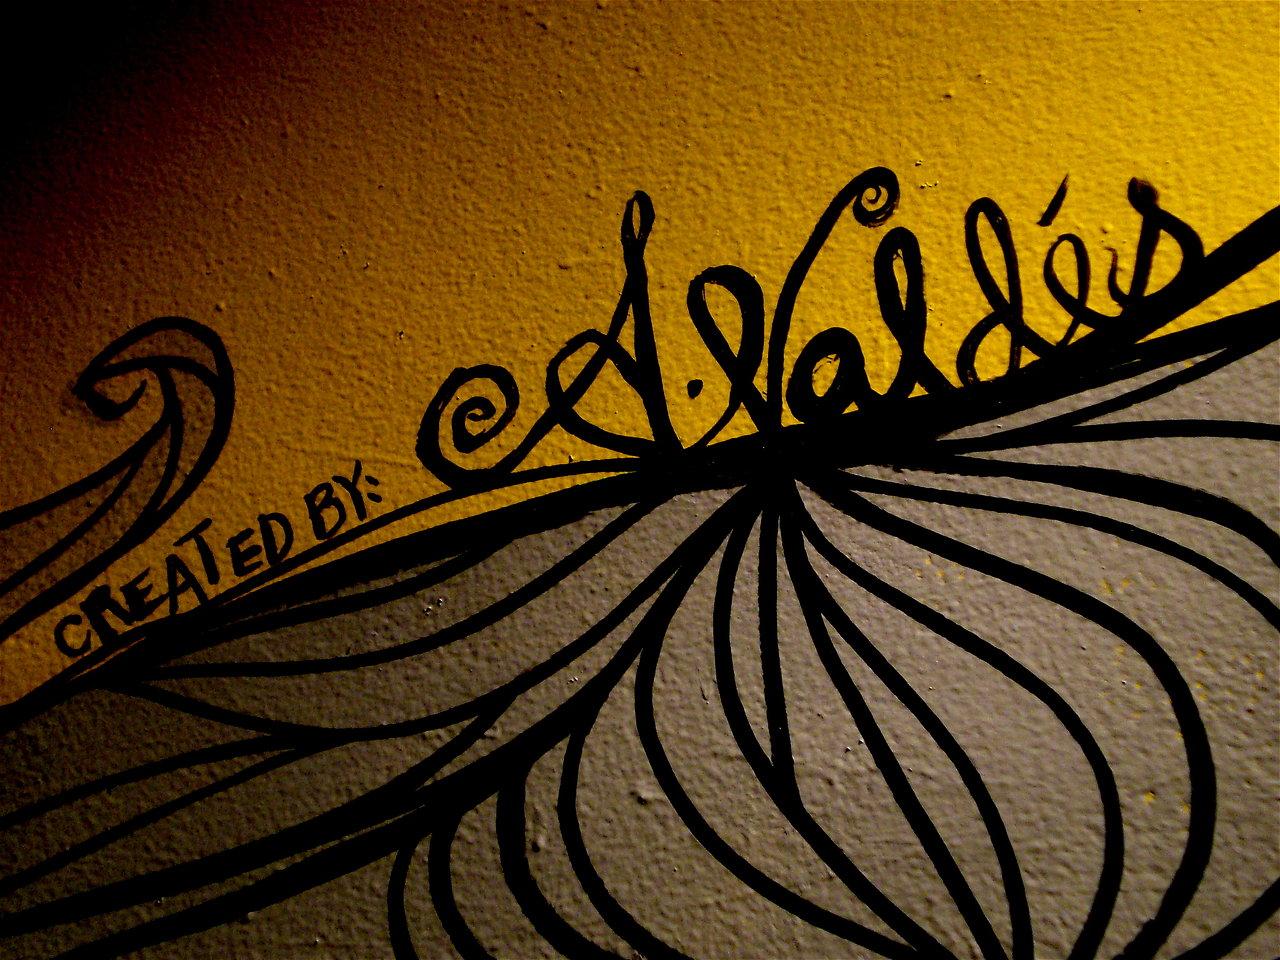 Respectable's Mural, 2009